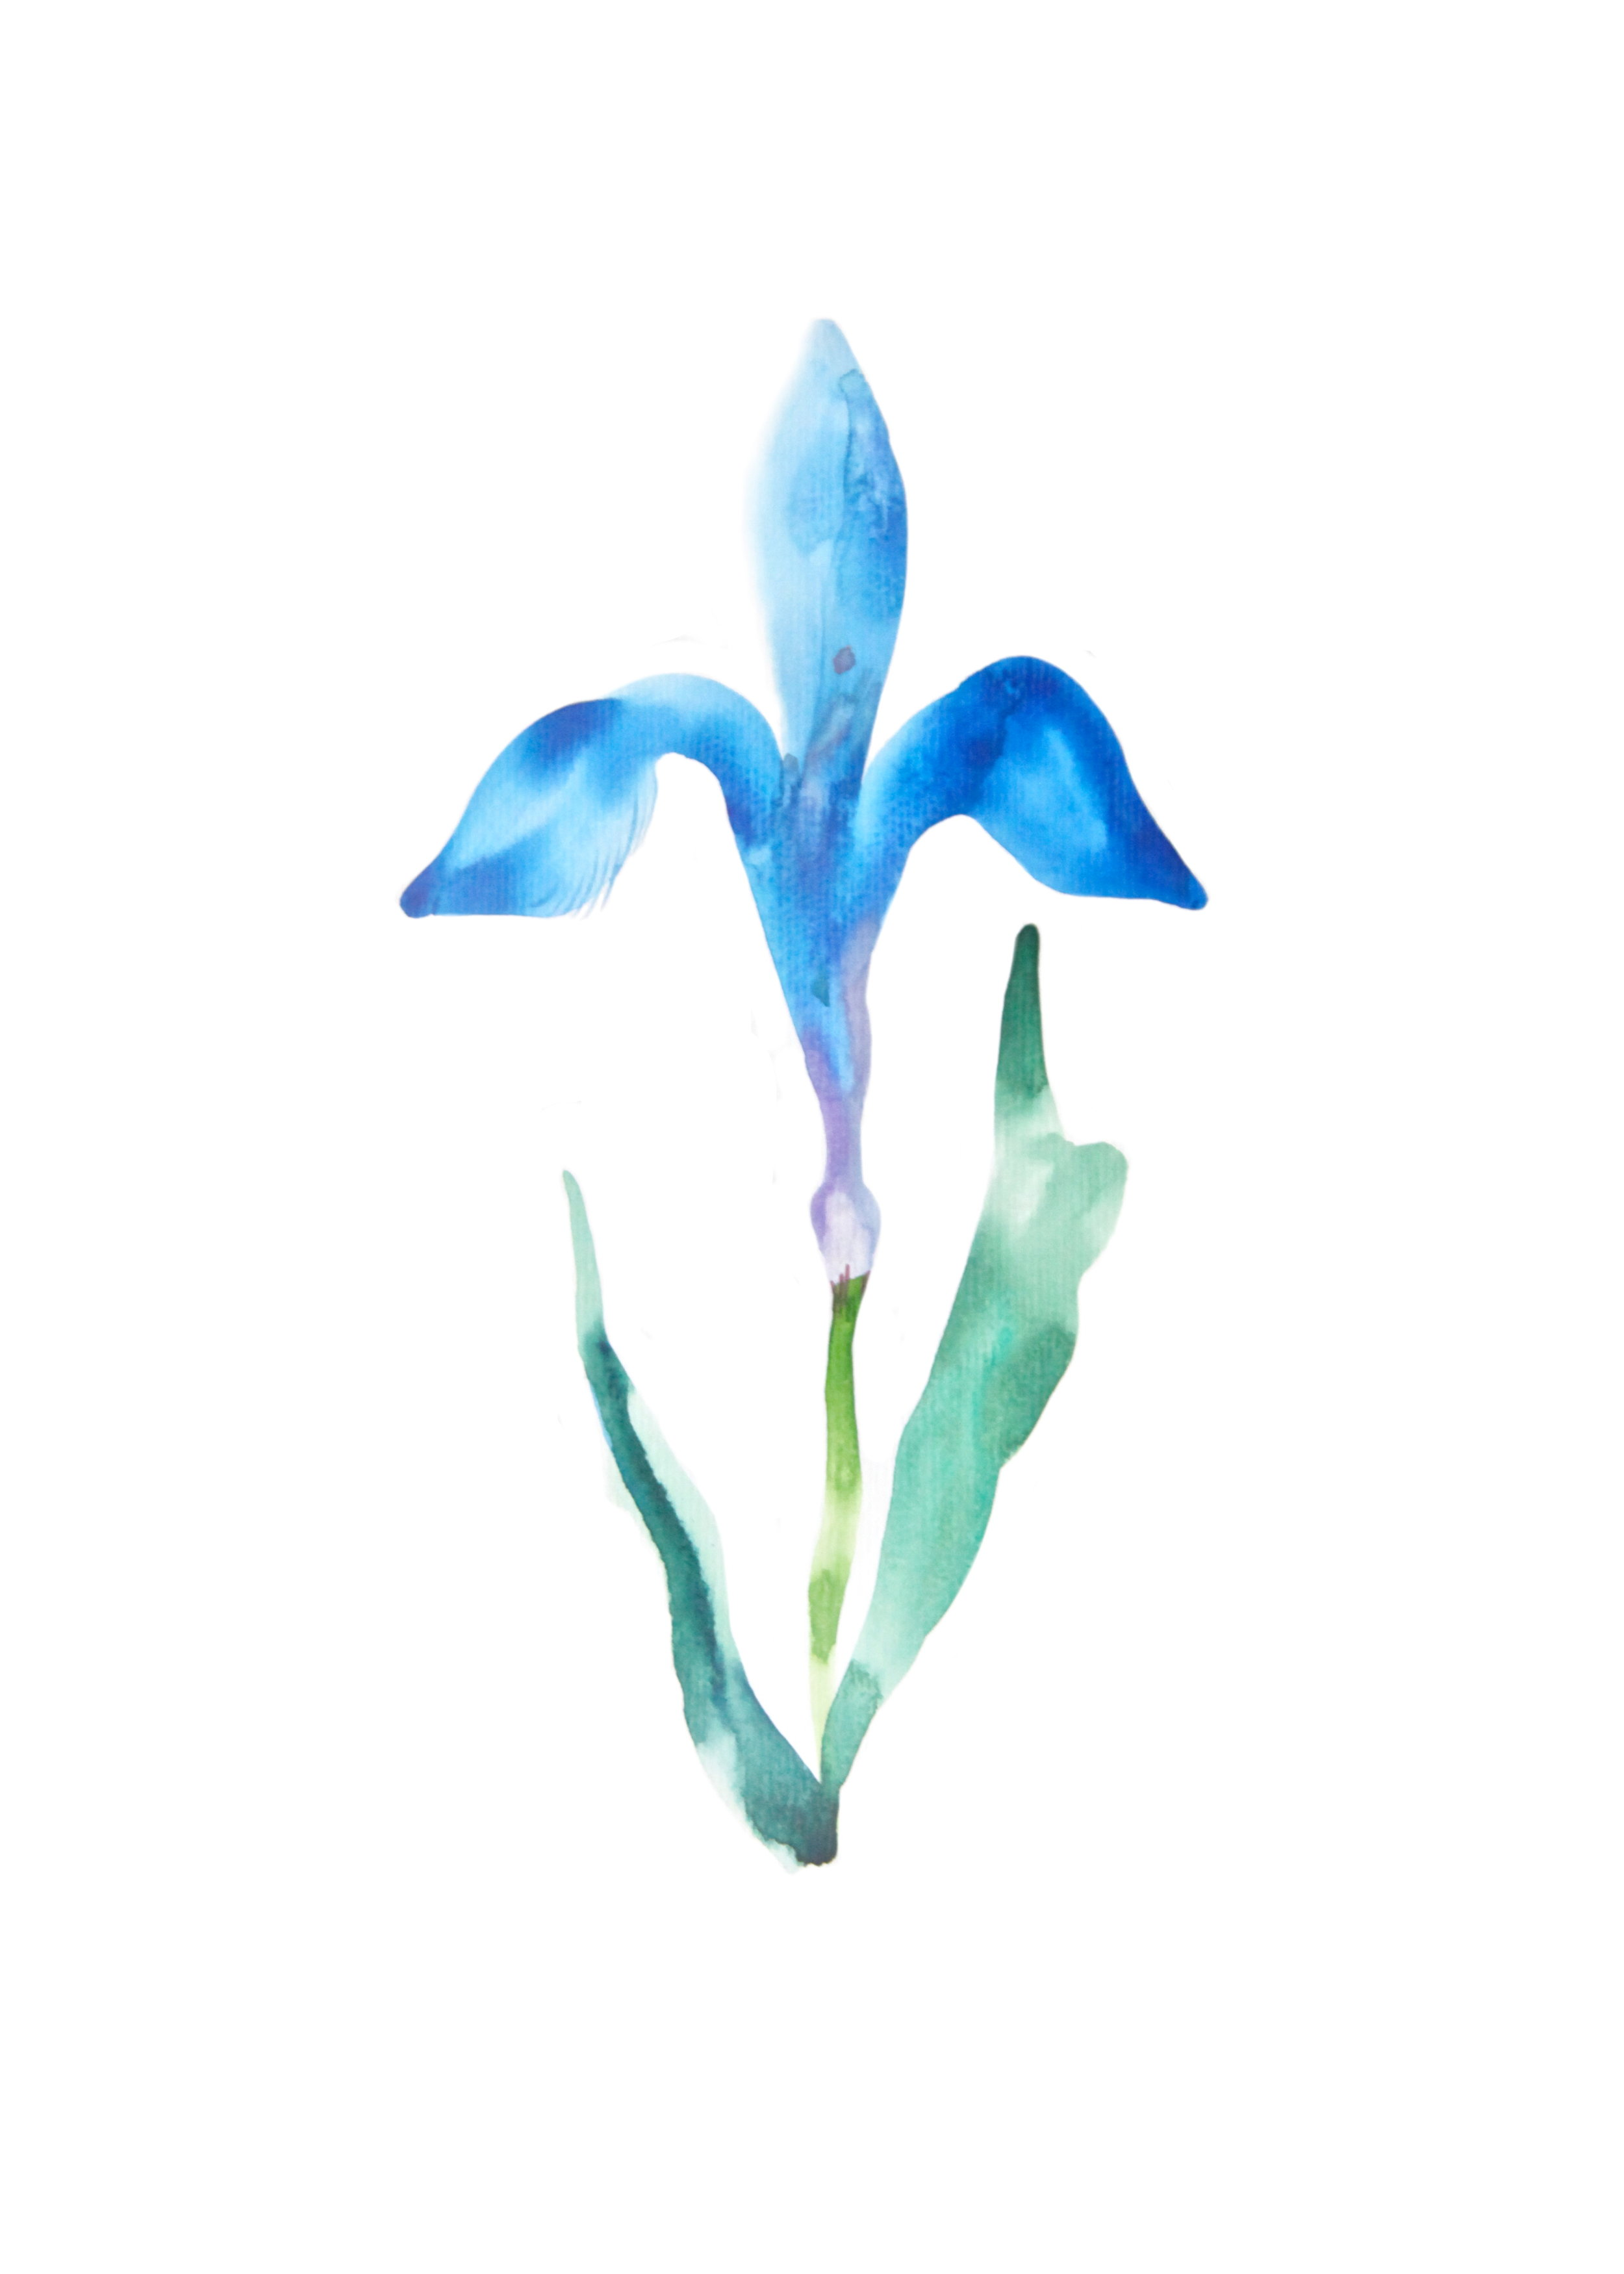 Lys  , 2016, watercolor on paper, 40x30cm